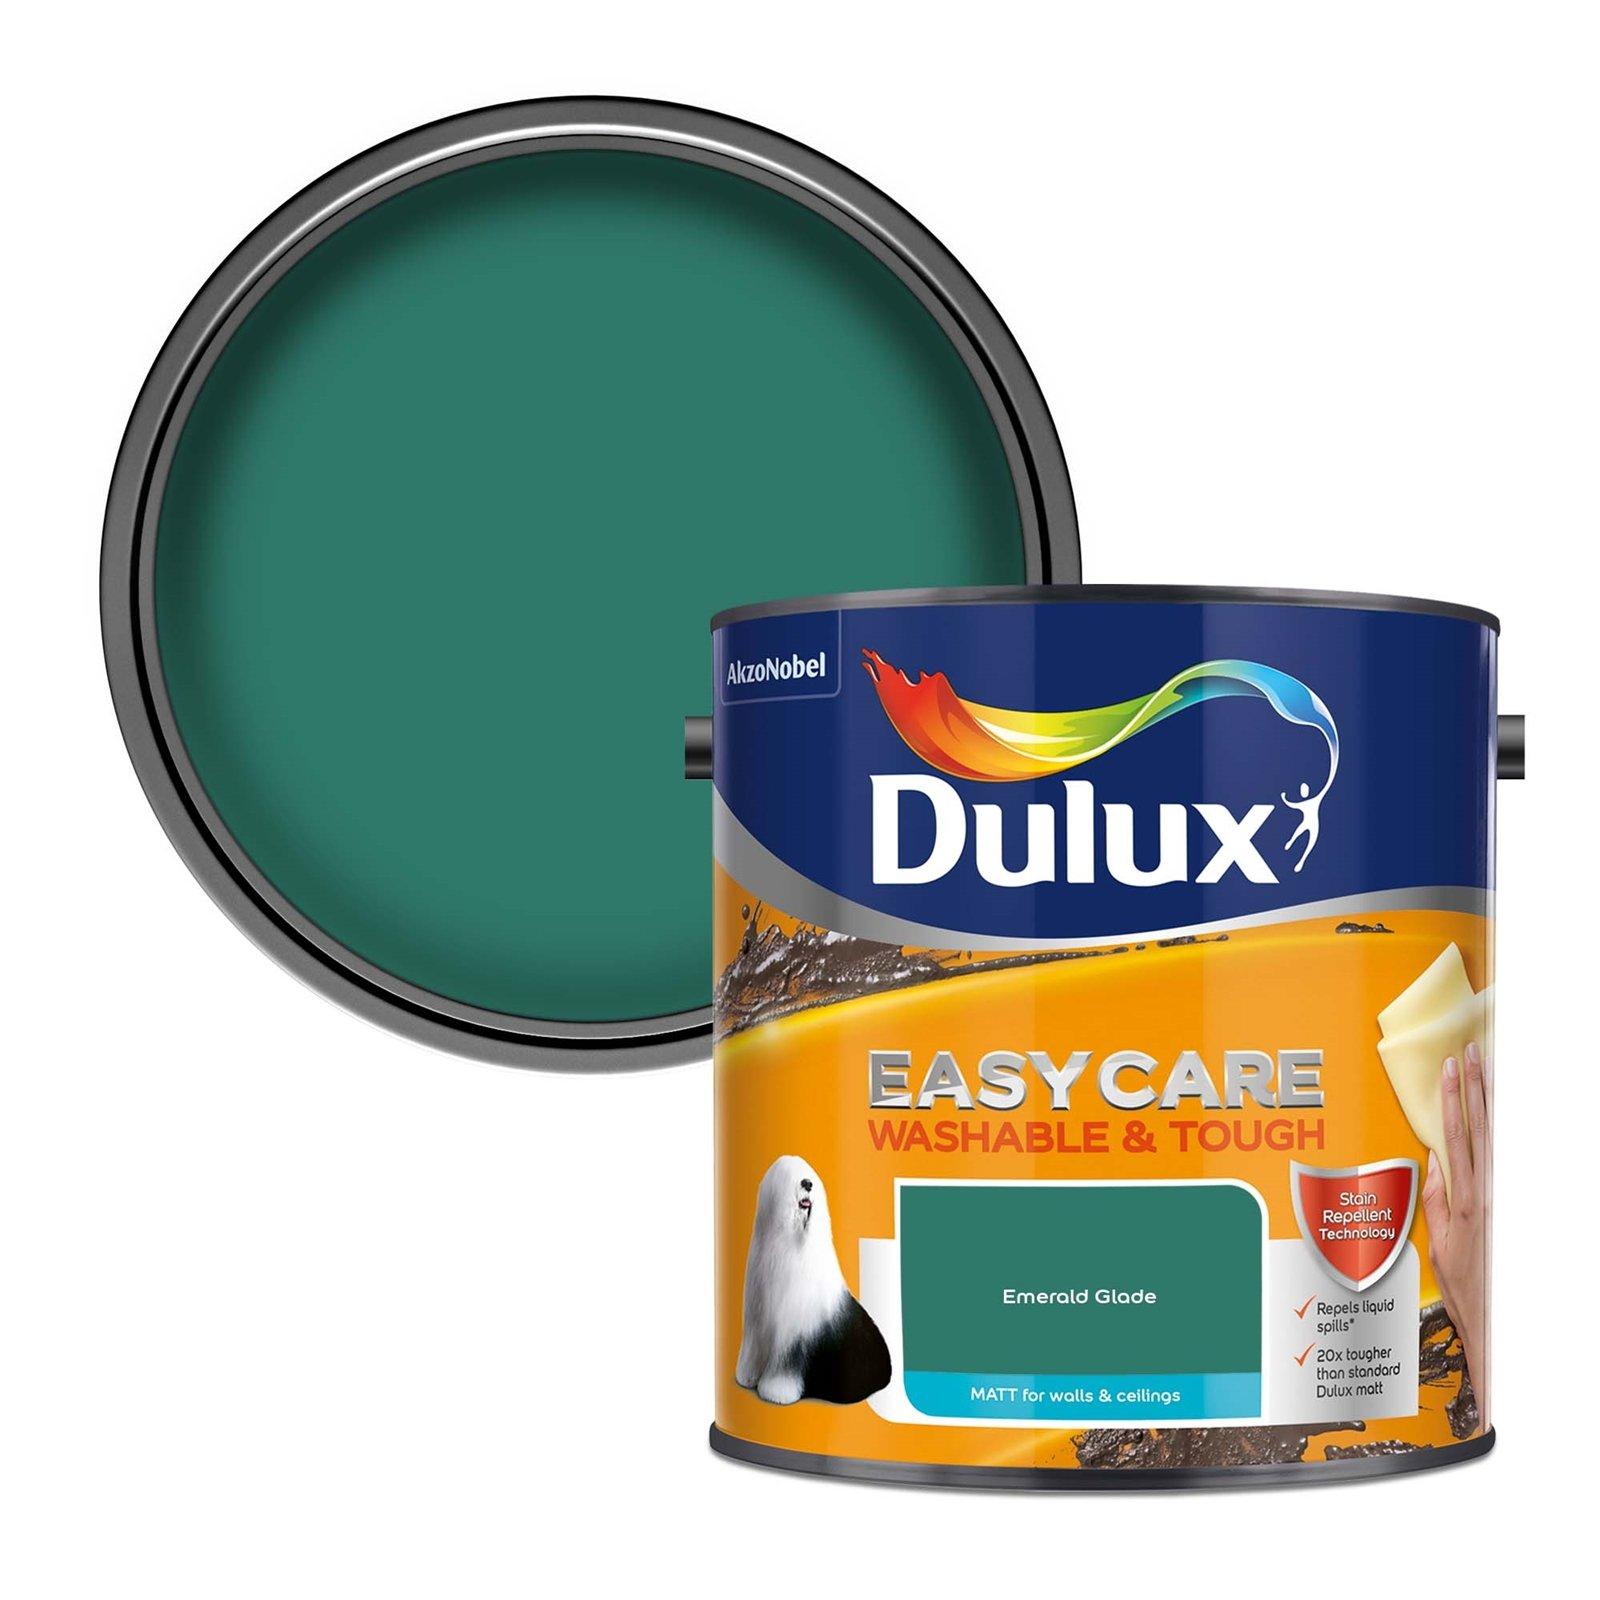 Online only 3 for 2 Dulux colour paint (e.g. Dulux Easycare Washable & Tough Emerald Glade Matt Paint 3 x 2.5L for £50 delivered) @ Homebase